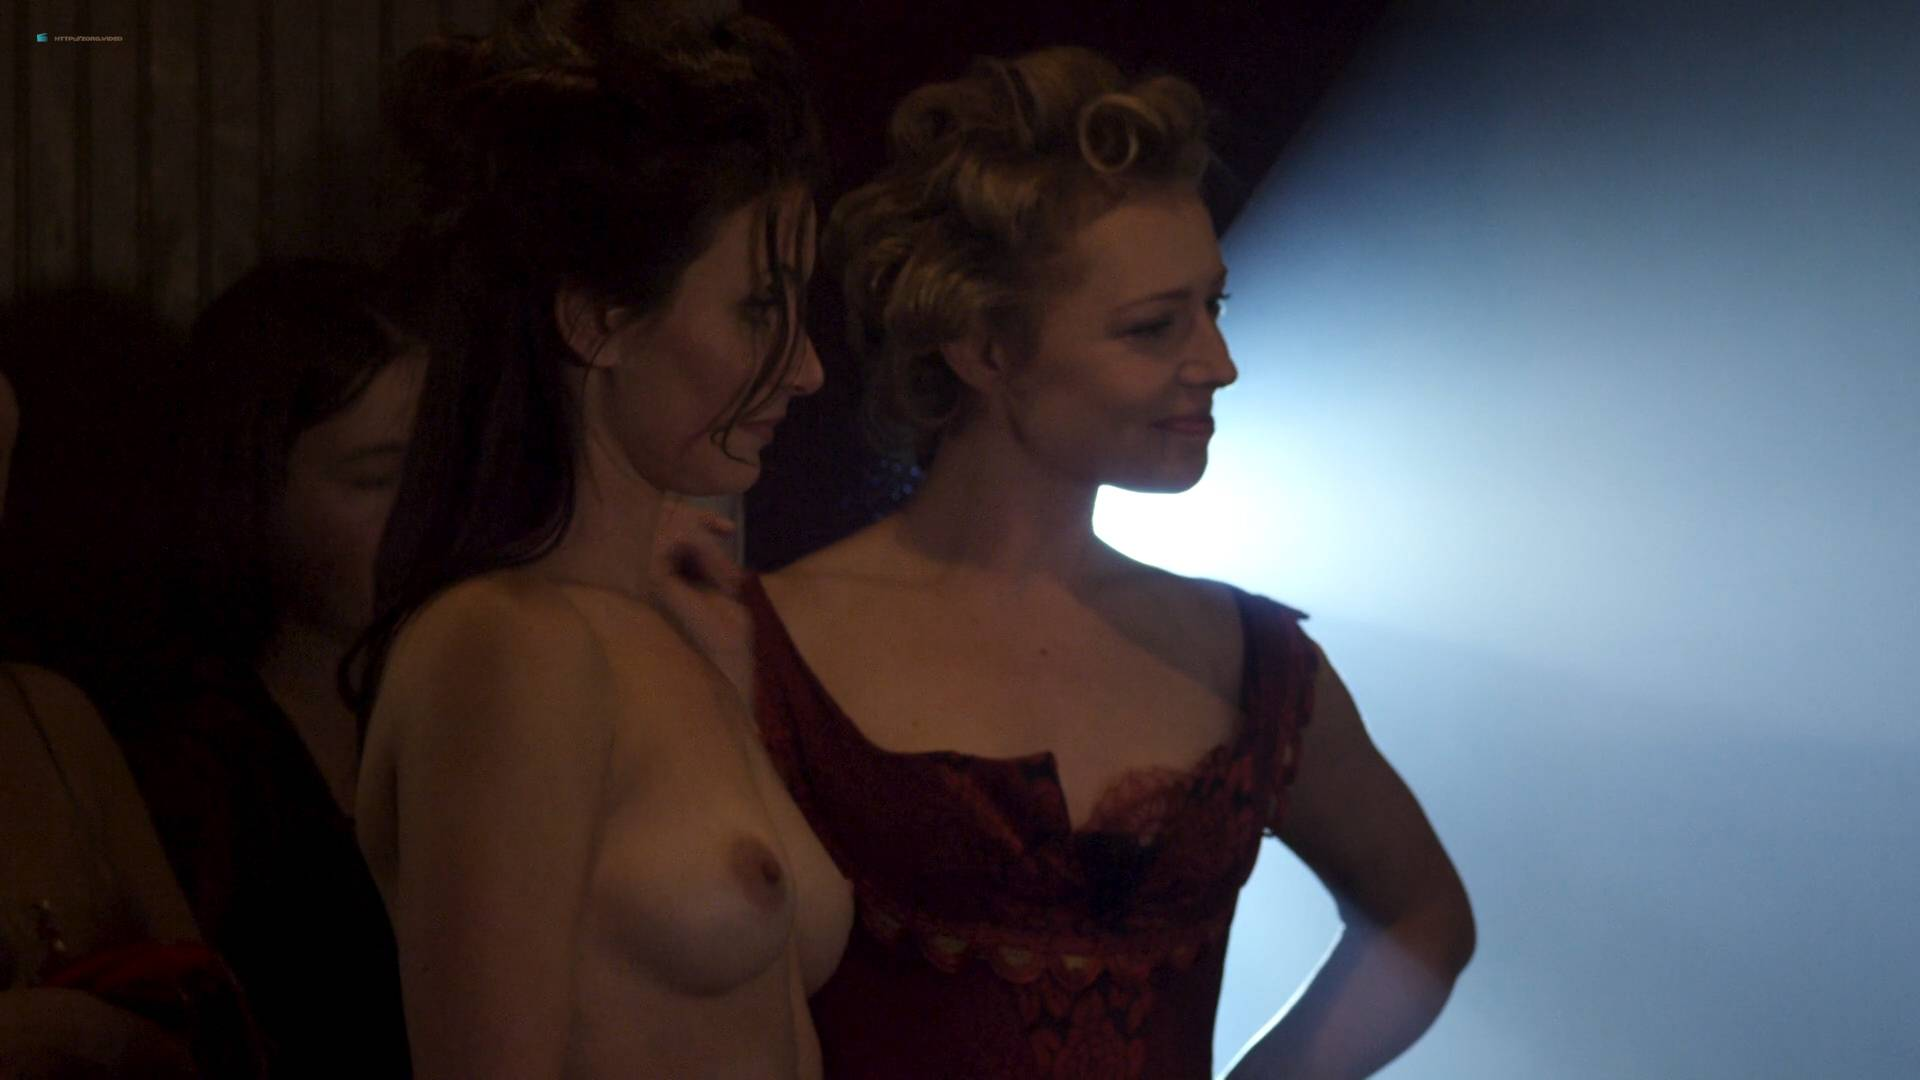 Elizabeth Lavender nude topless Elysia Rotaru nude butt boobs - Dead Again in Tombstone (2017) HD 1080p BluRay (11)